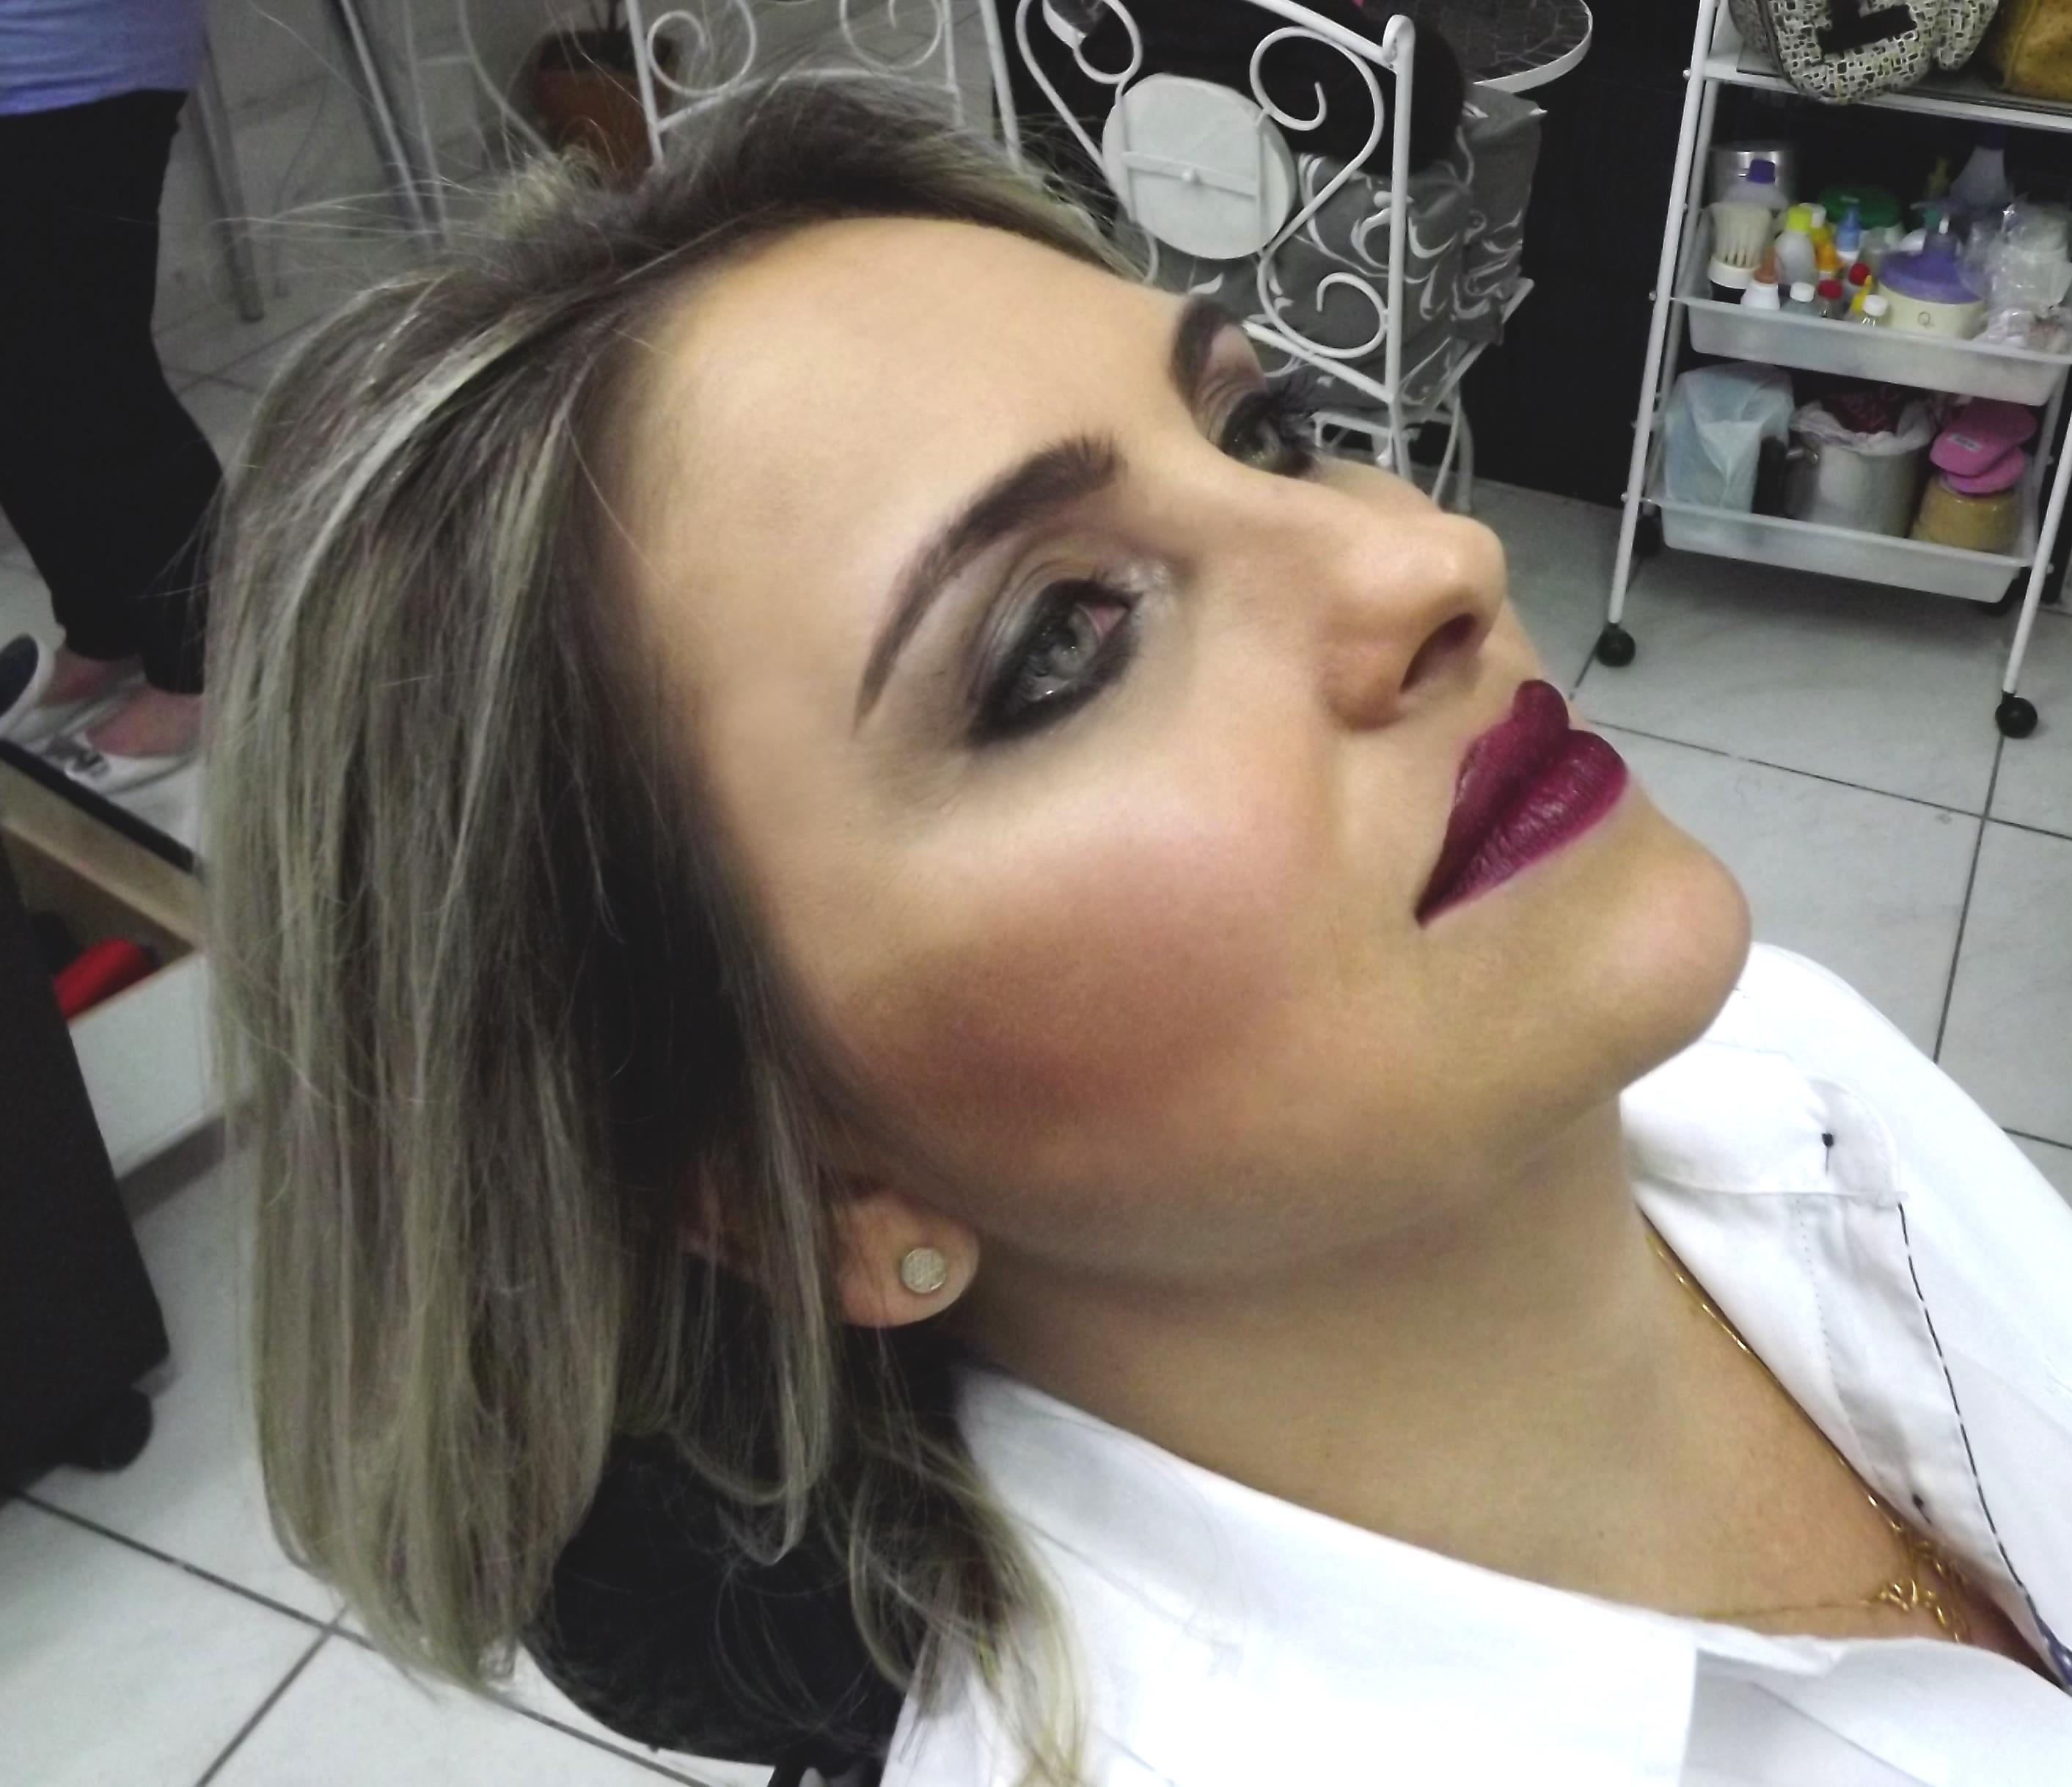 #festa #casamento #makeup #diva #beleza #faellodesigner maquiagem micropigmentador(a) designer de sobrancelhas maquiador(a) dermopigmentador(a)